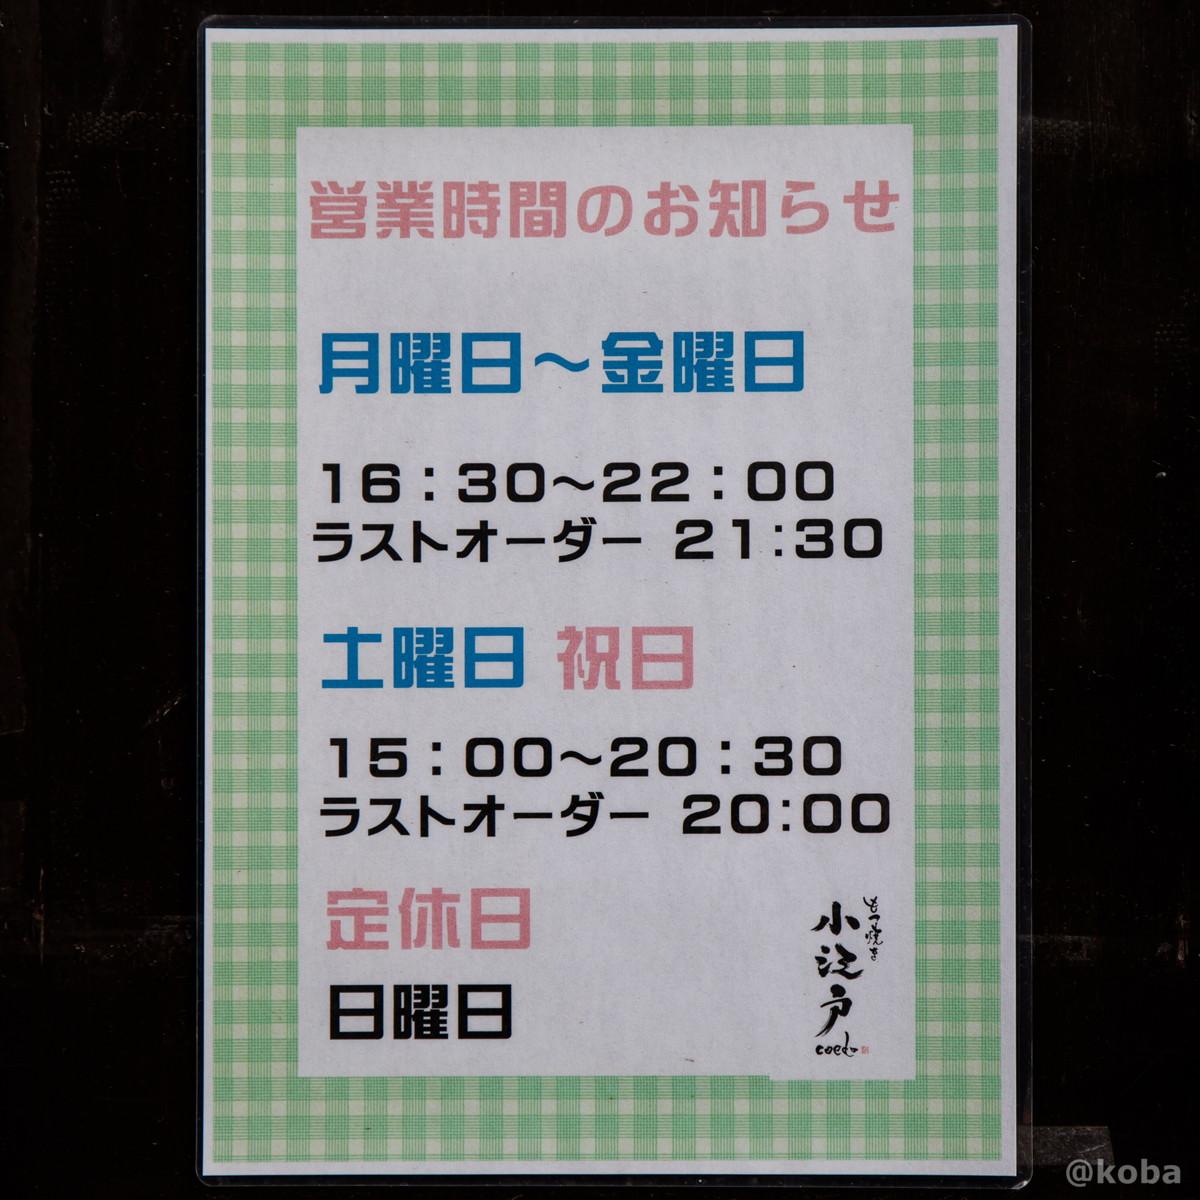 営業時間 定休日の写真|小江戸(coedo)居酒屋 もつ焼き|東京都葛飾区・京成青砥